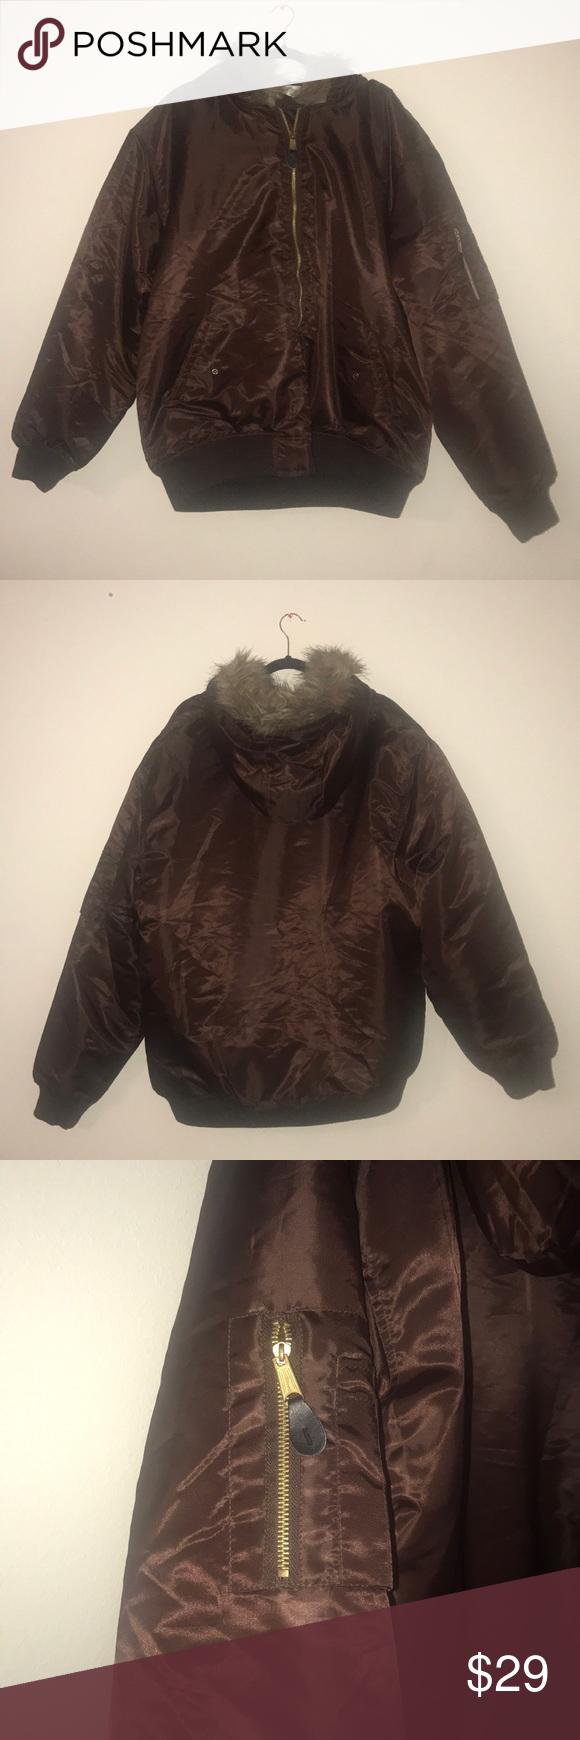 Men's puffer jacket Fur hood jacket, Puffer jackets